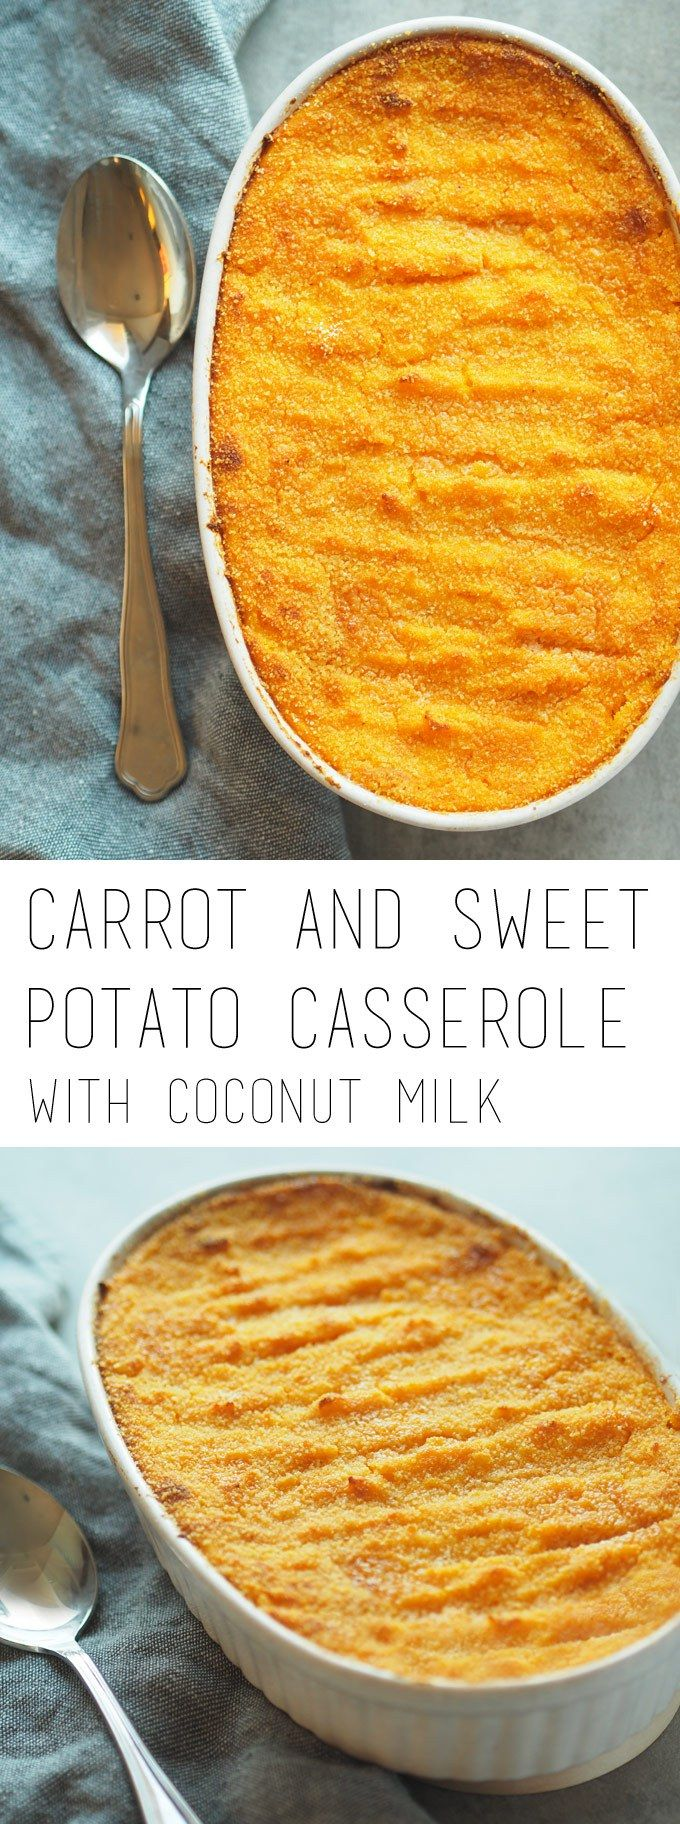 Carrot and sweet potato casserole with coconut milk - traditional Finnish Christmas food #porkkanalaatikko